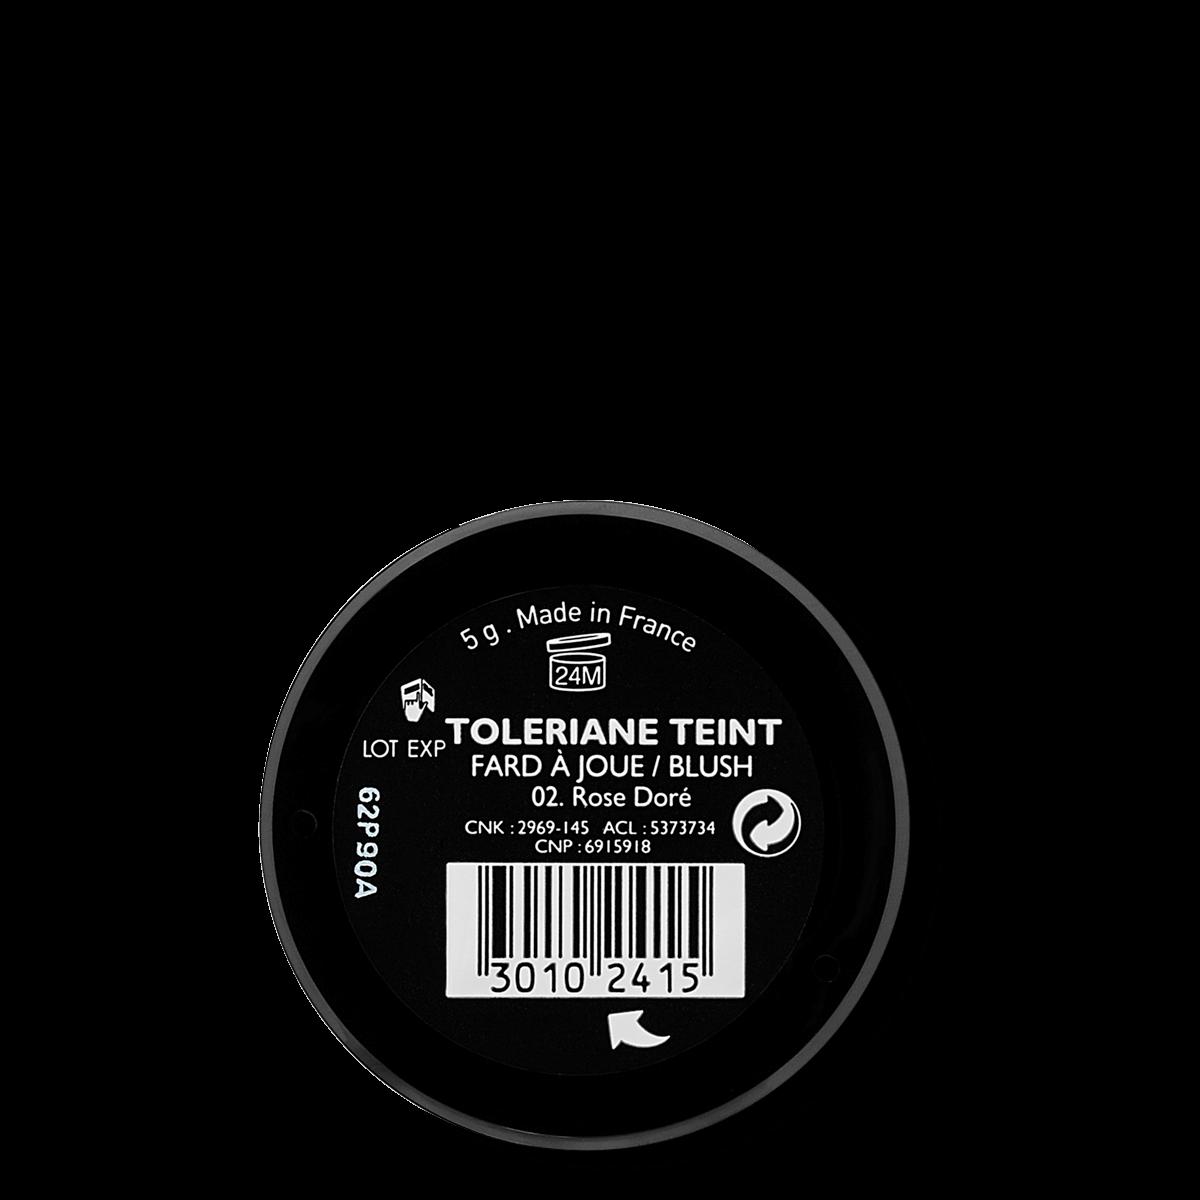 La Roche Posay Sensitiv Toleriane Sminke BLUSH GoldenPink 30102415 B